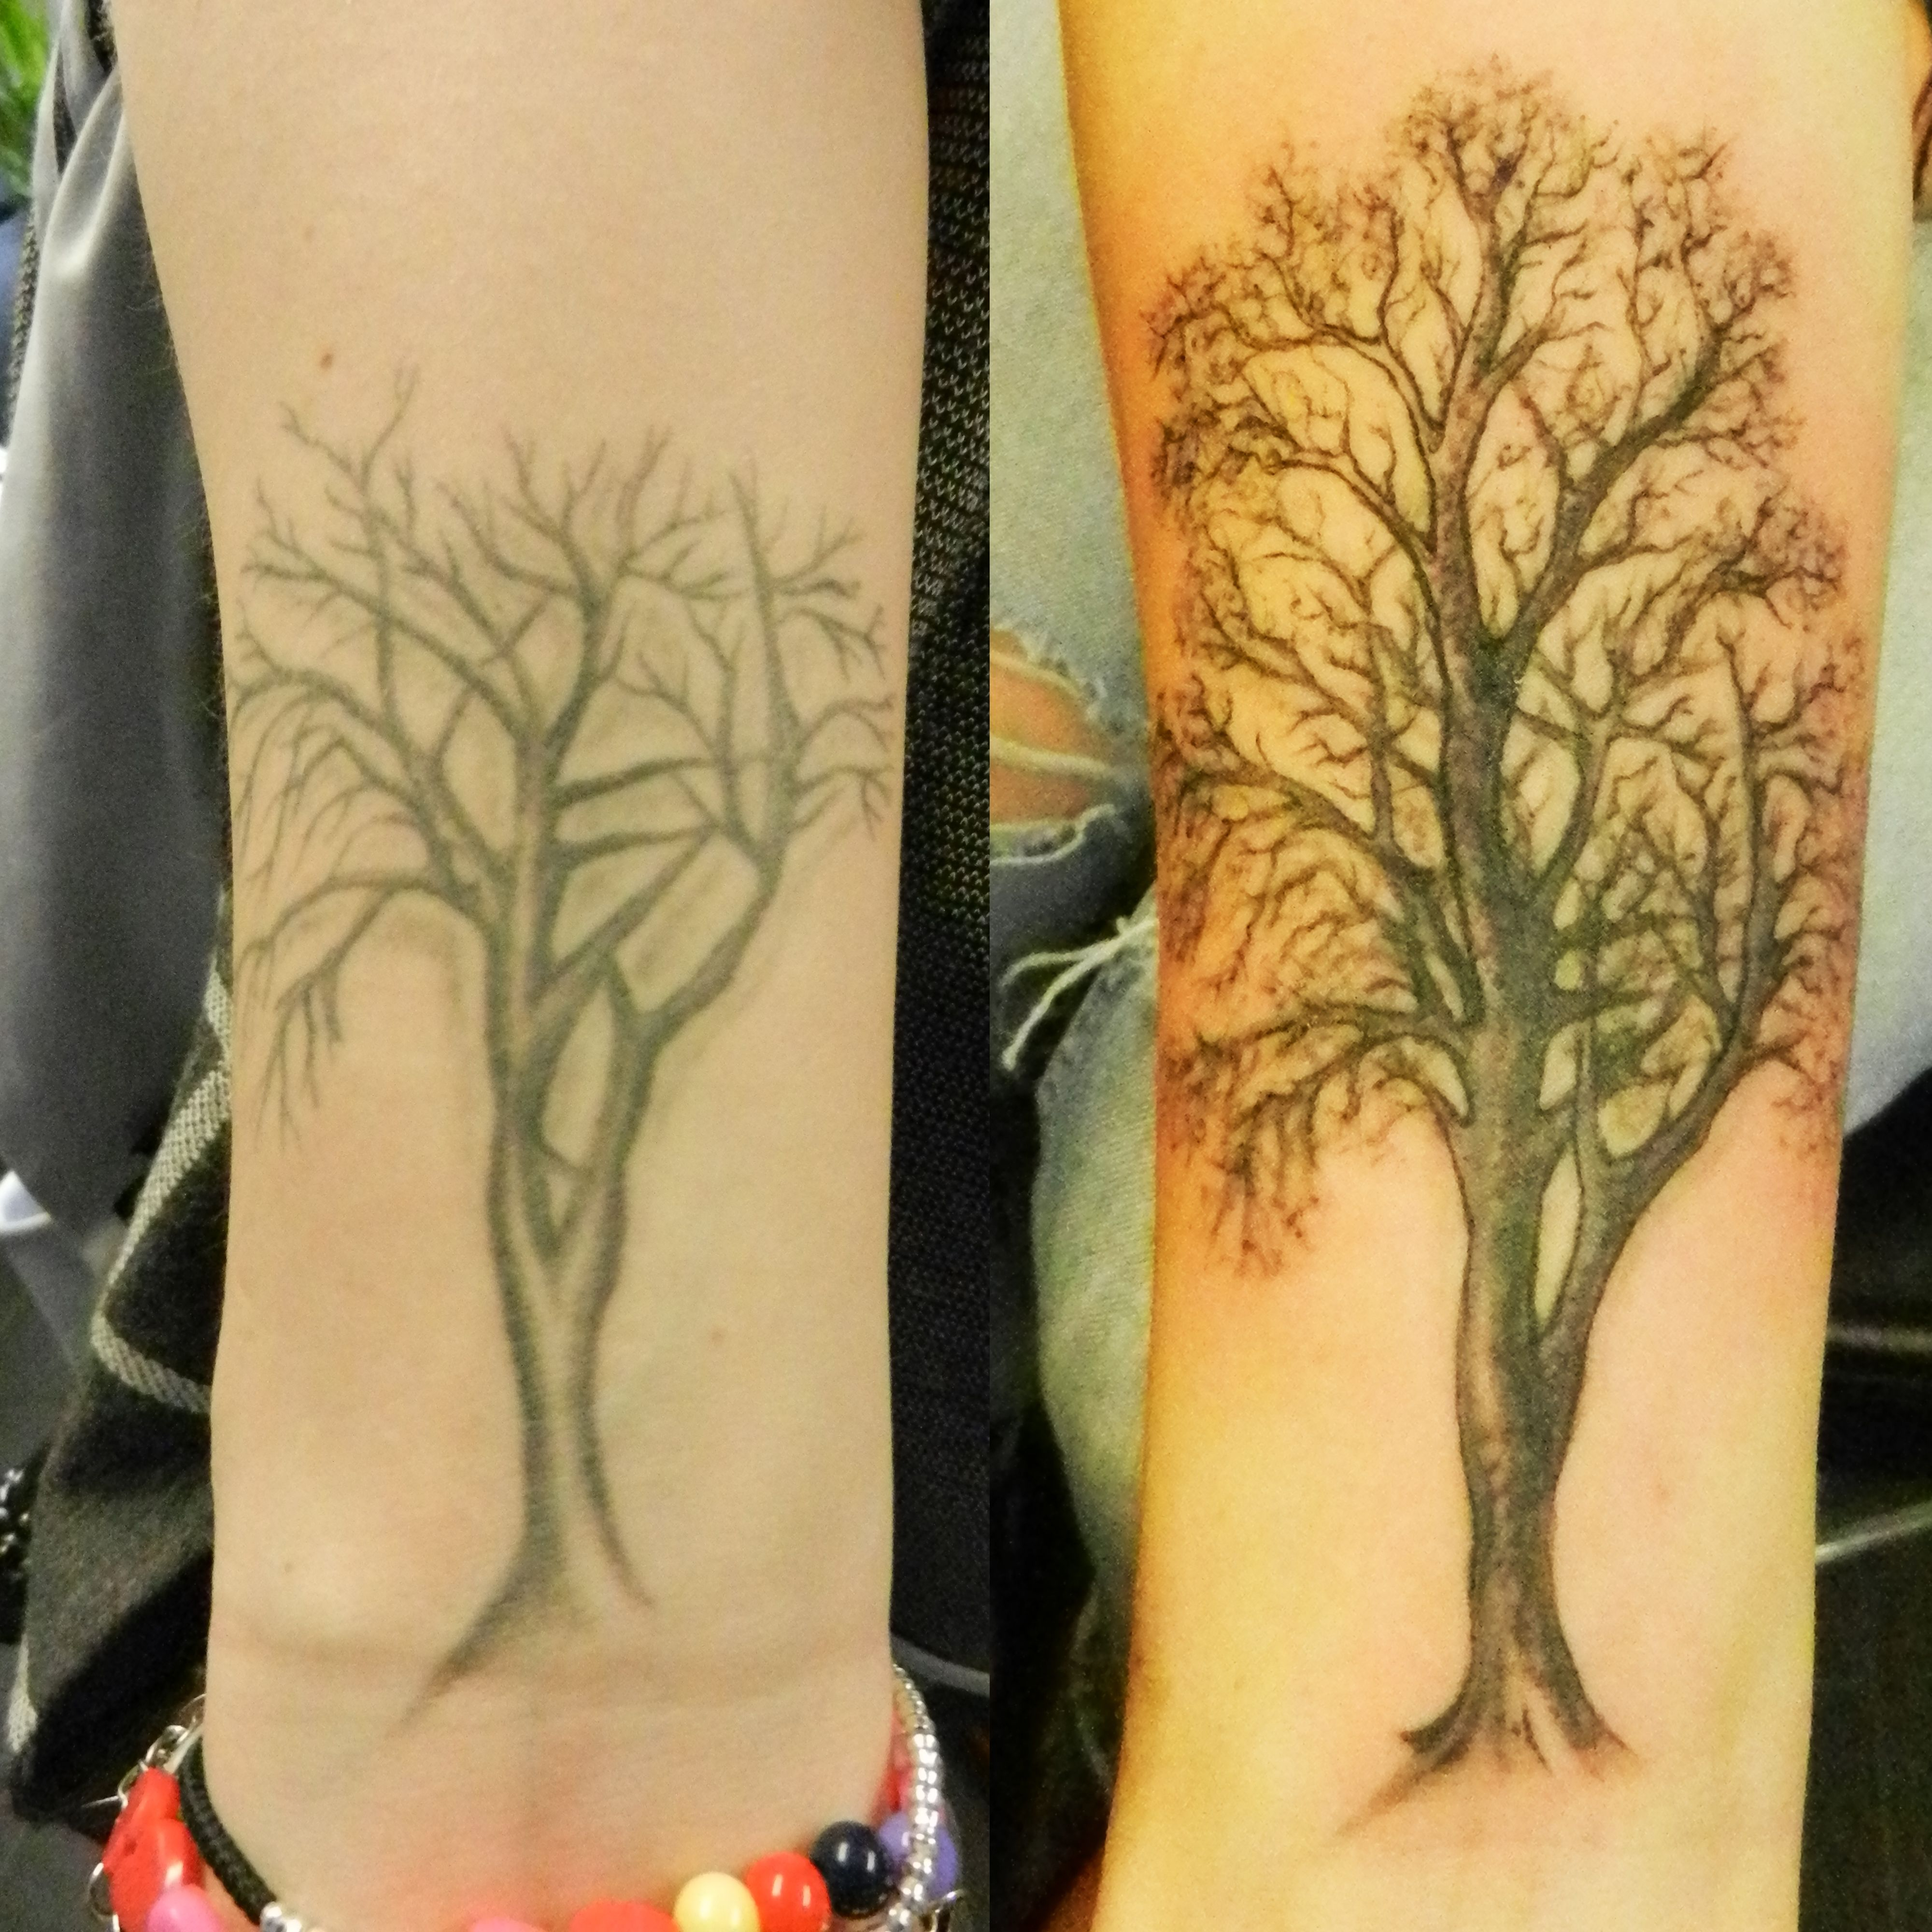 Tattoo Removal Cornwall